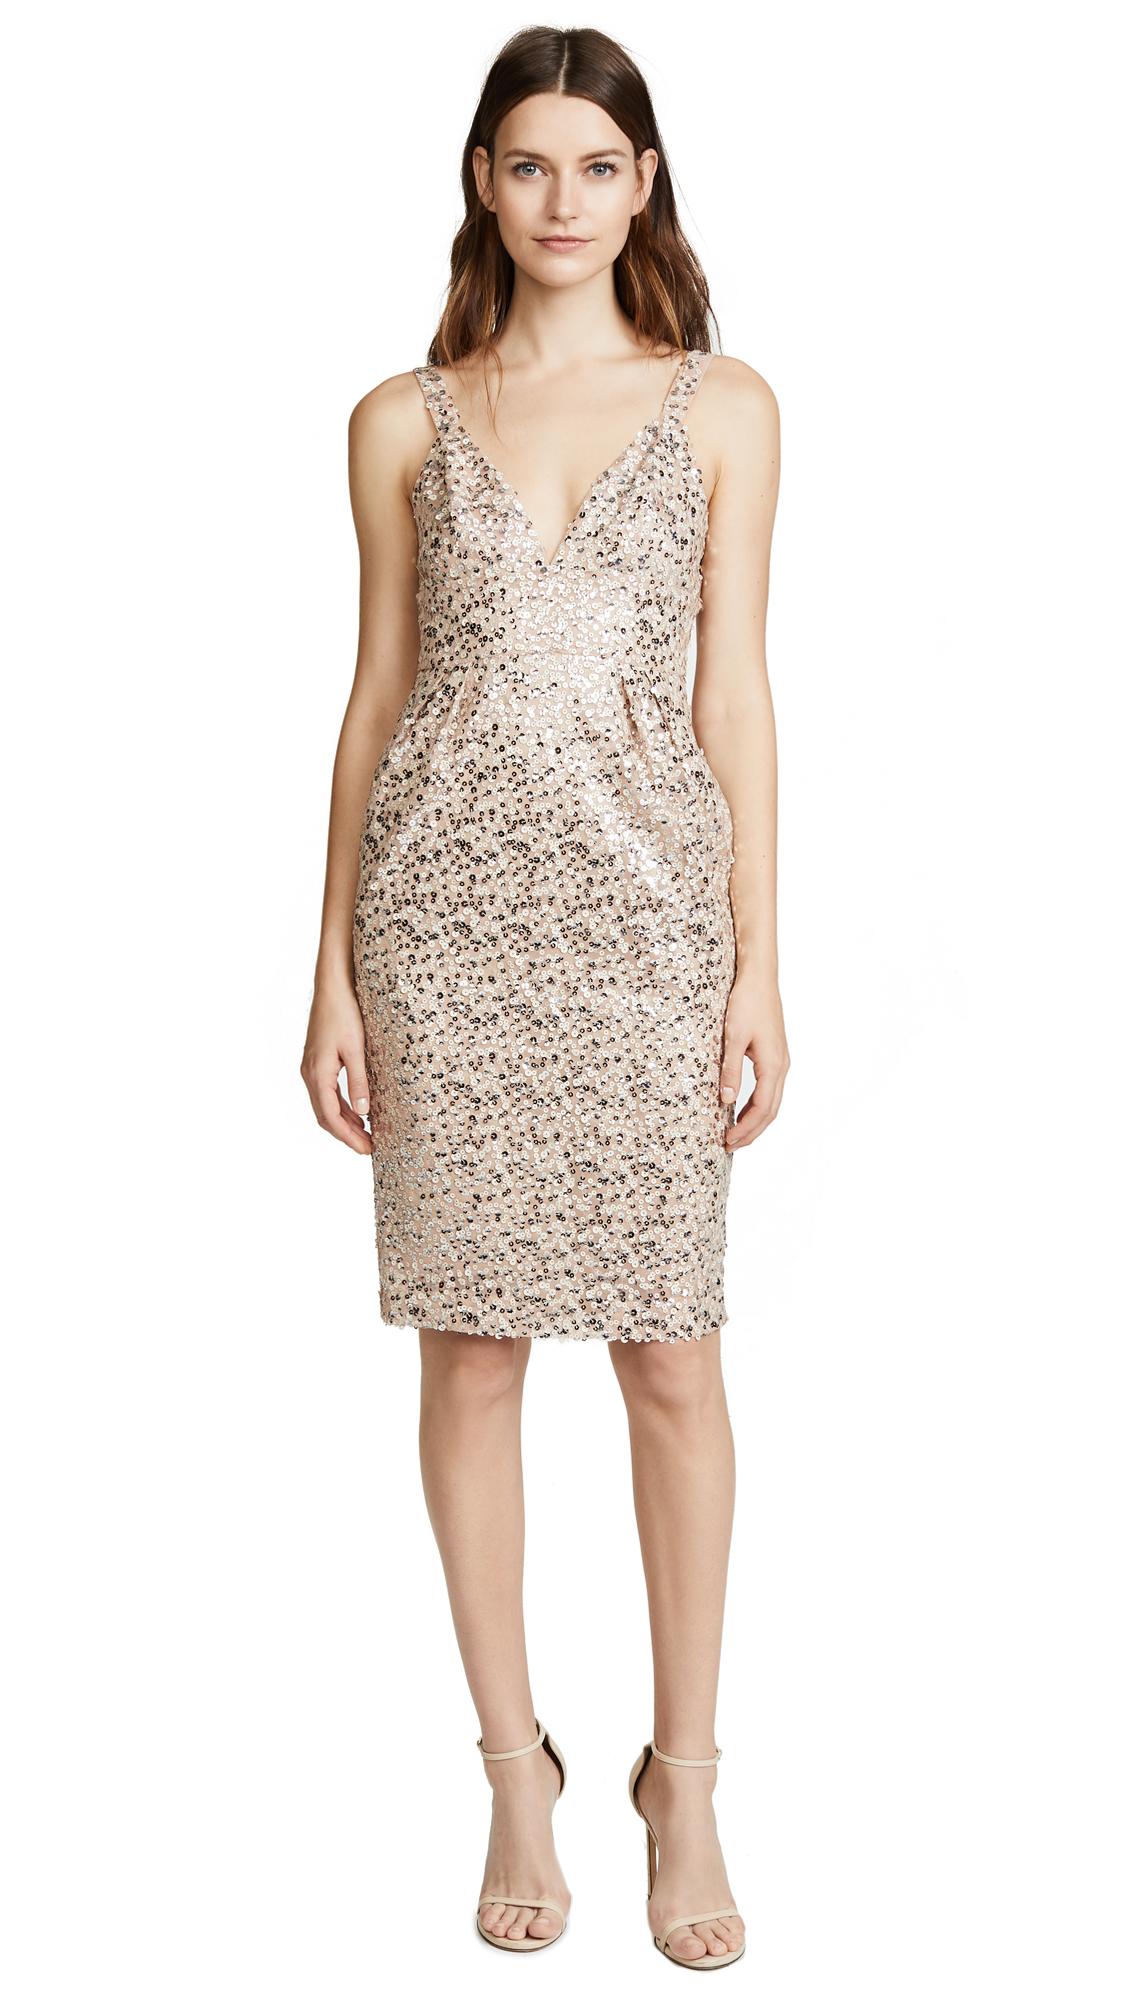 Jill Jill Stuart Sequin Dress